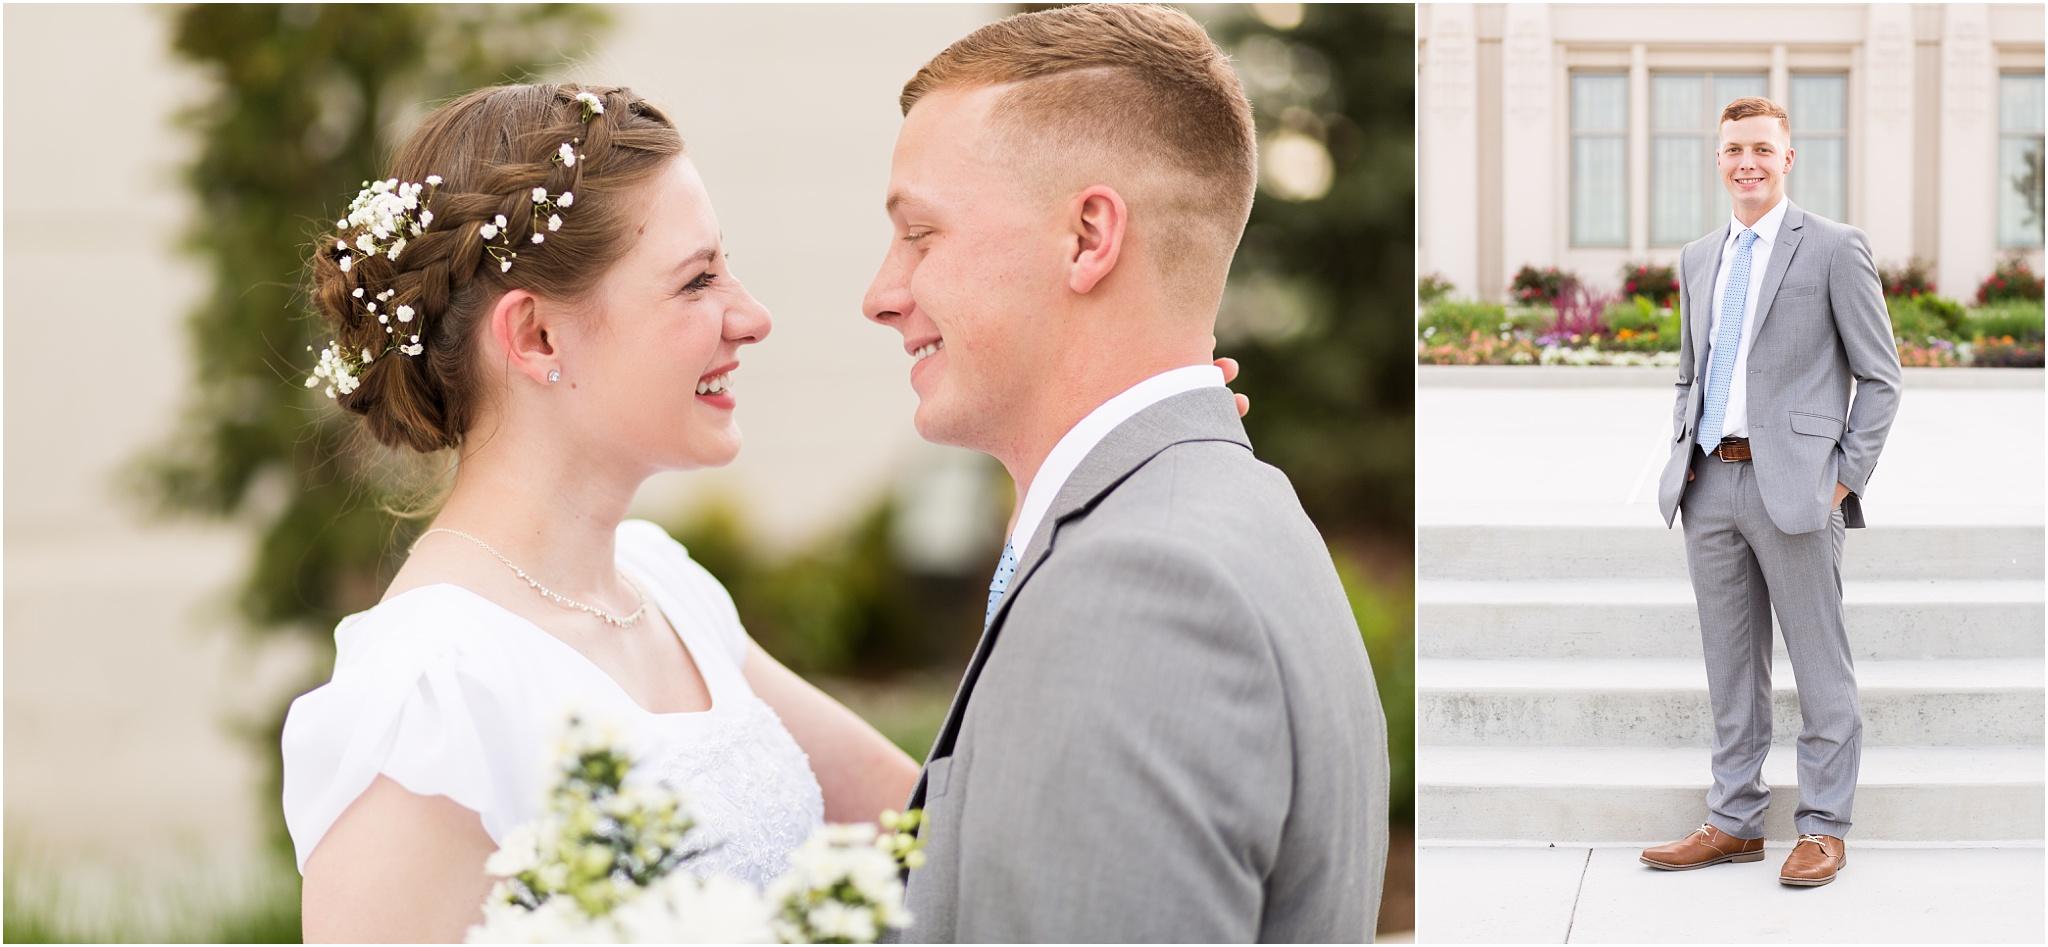 Wedding Photography_Meridian Idaho Temple_Boise Idaho_Leah Southwick Photography_0040.jpg